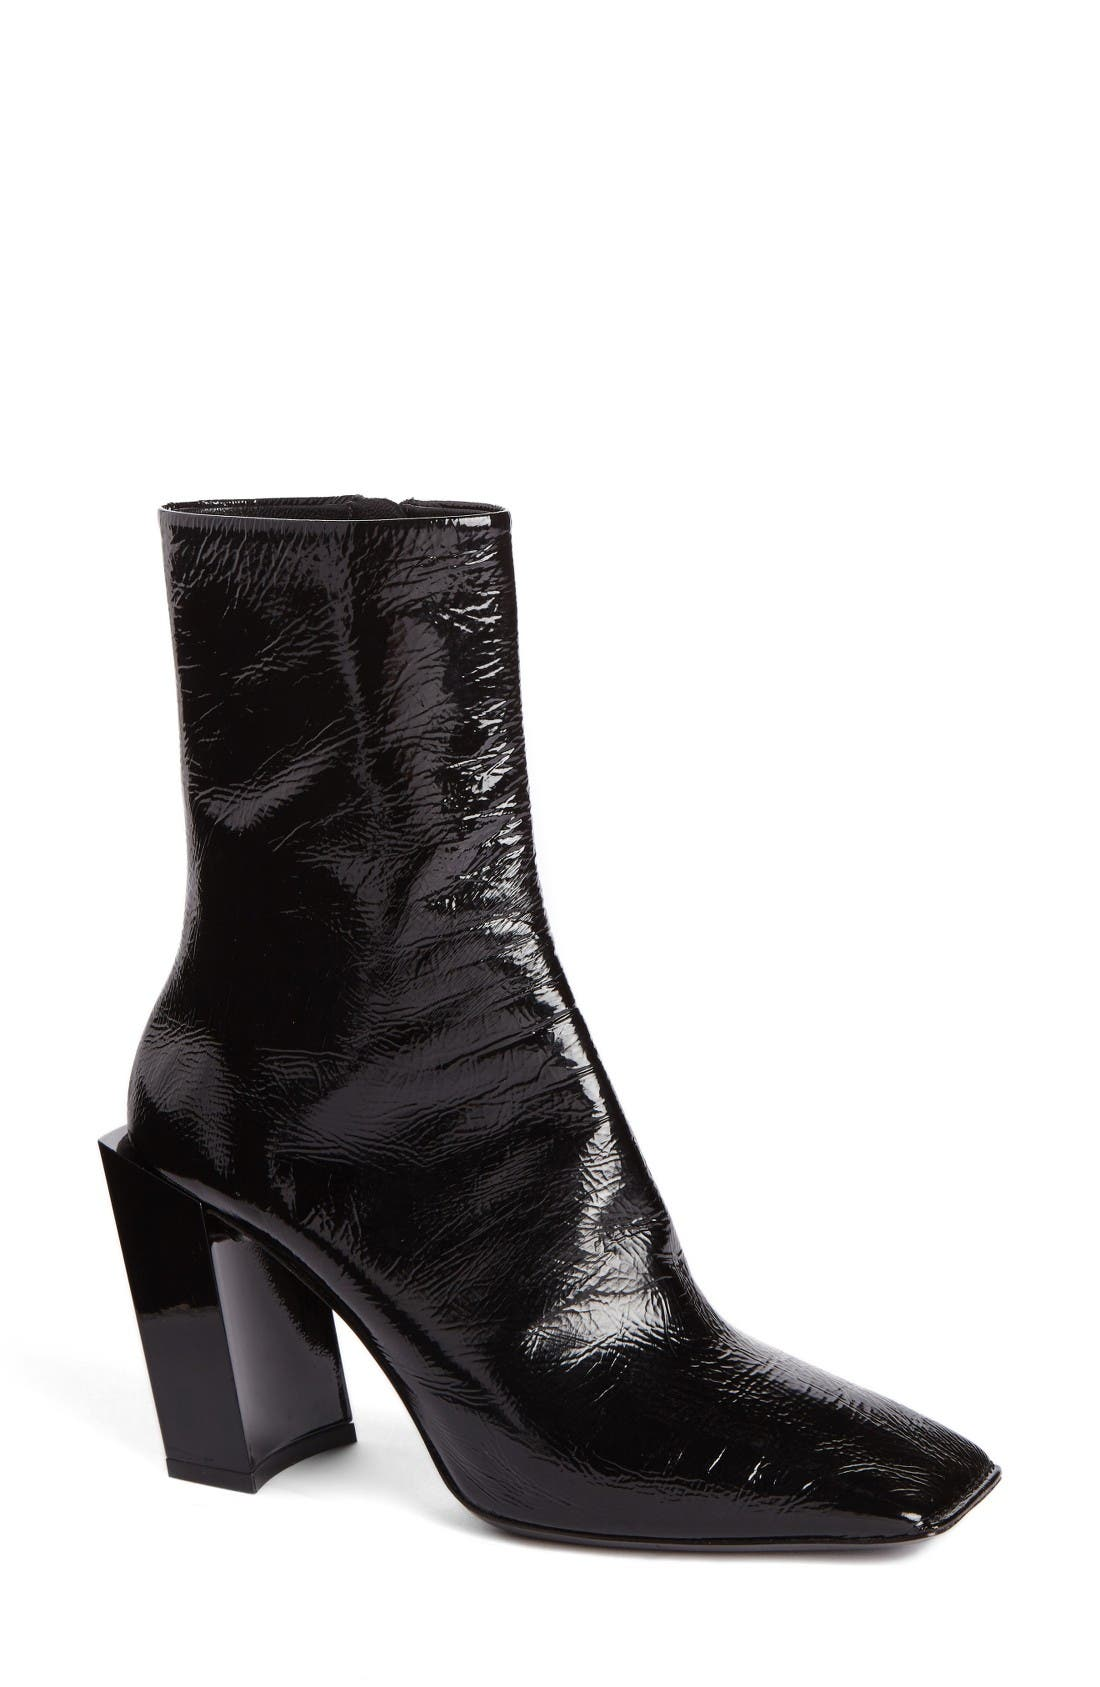 Main Image - Balenciaga Square Toe Boot (Women)